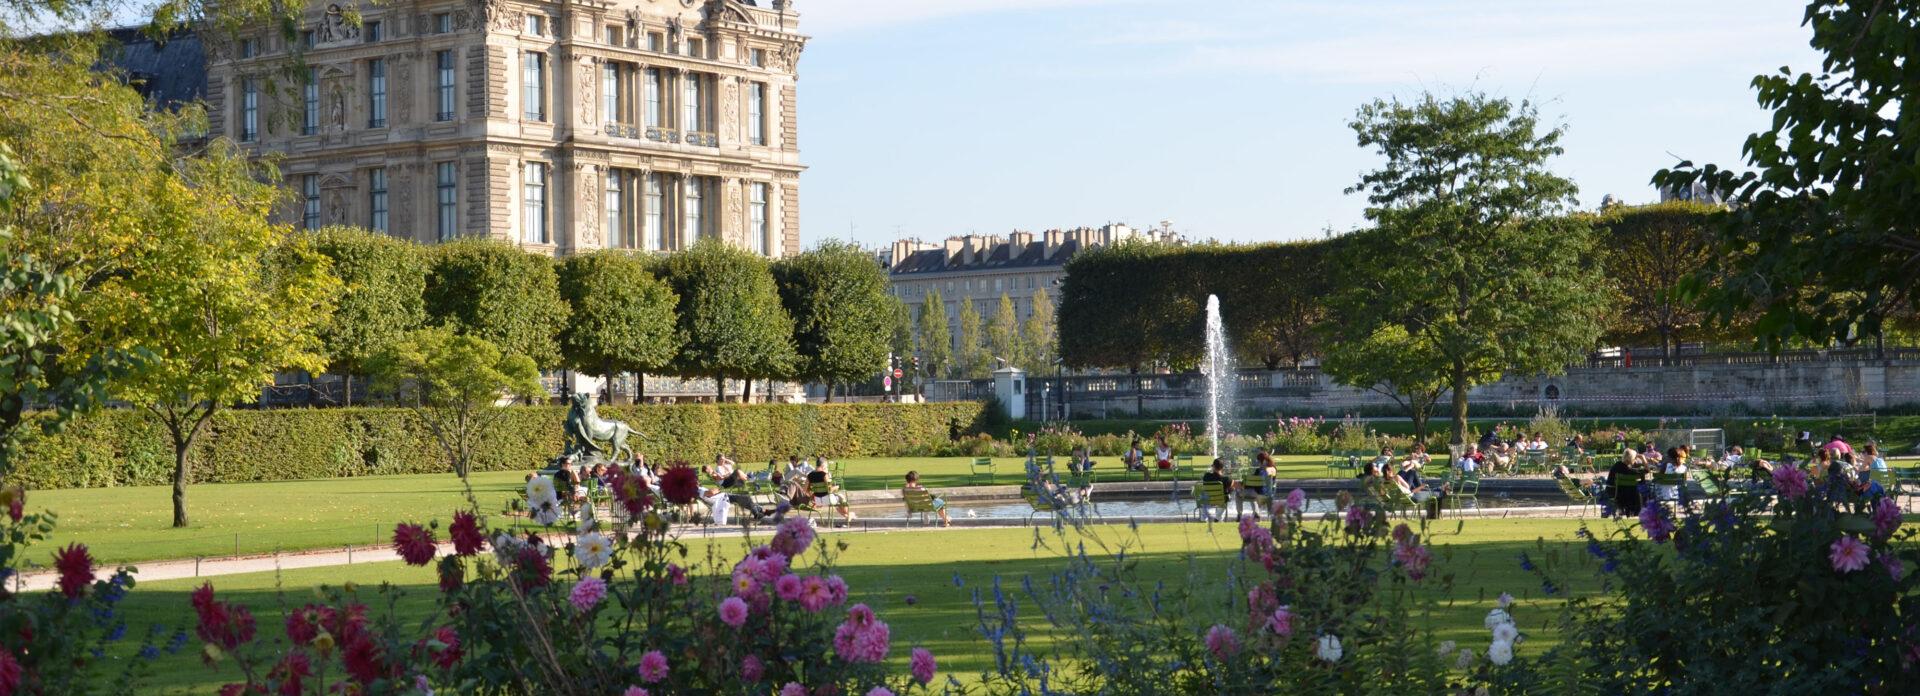 Jardin de Tuileries-parken Paris Parc grontomrade